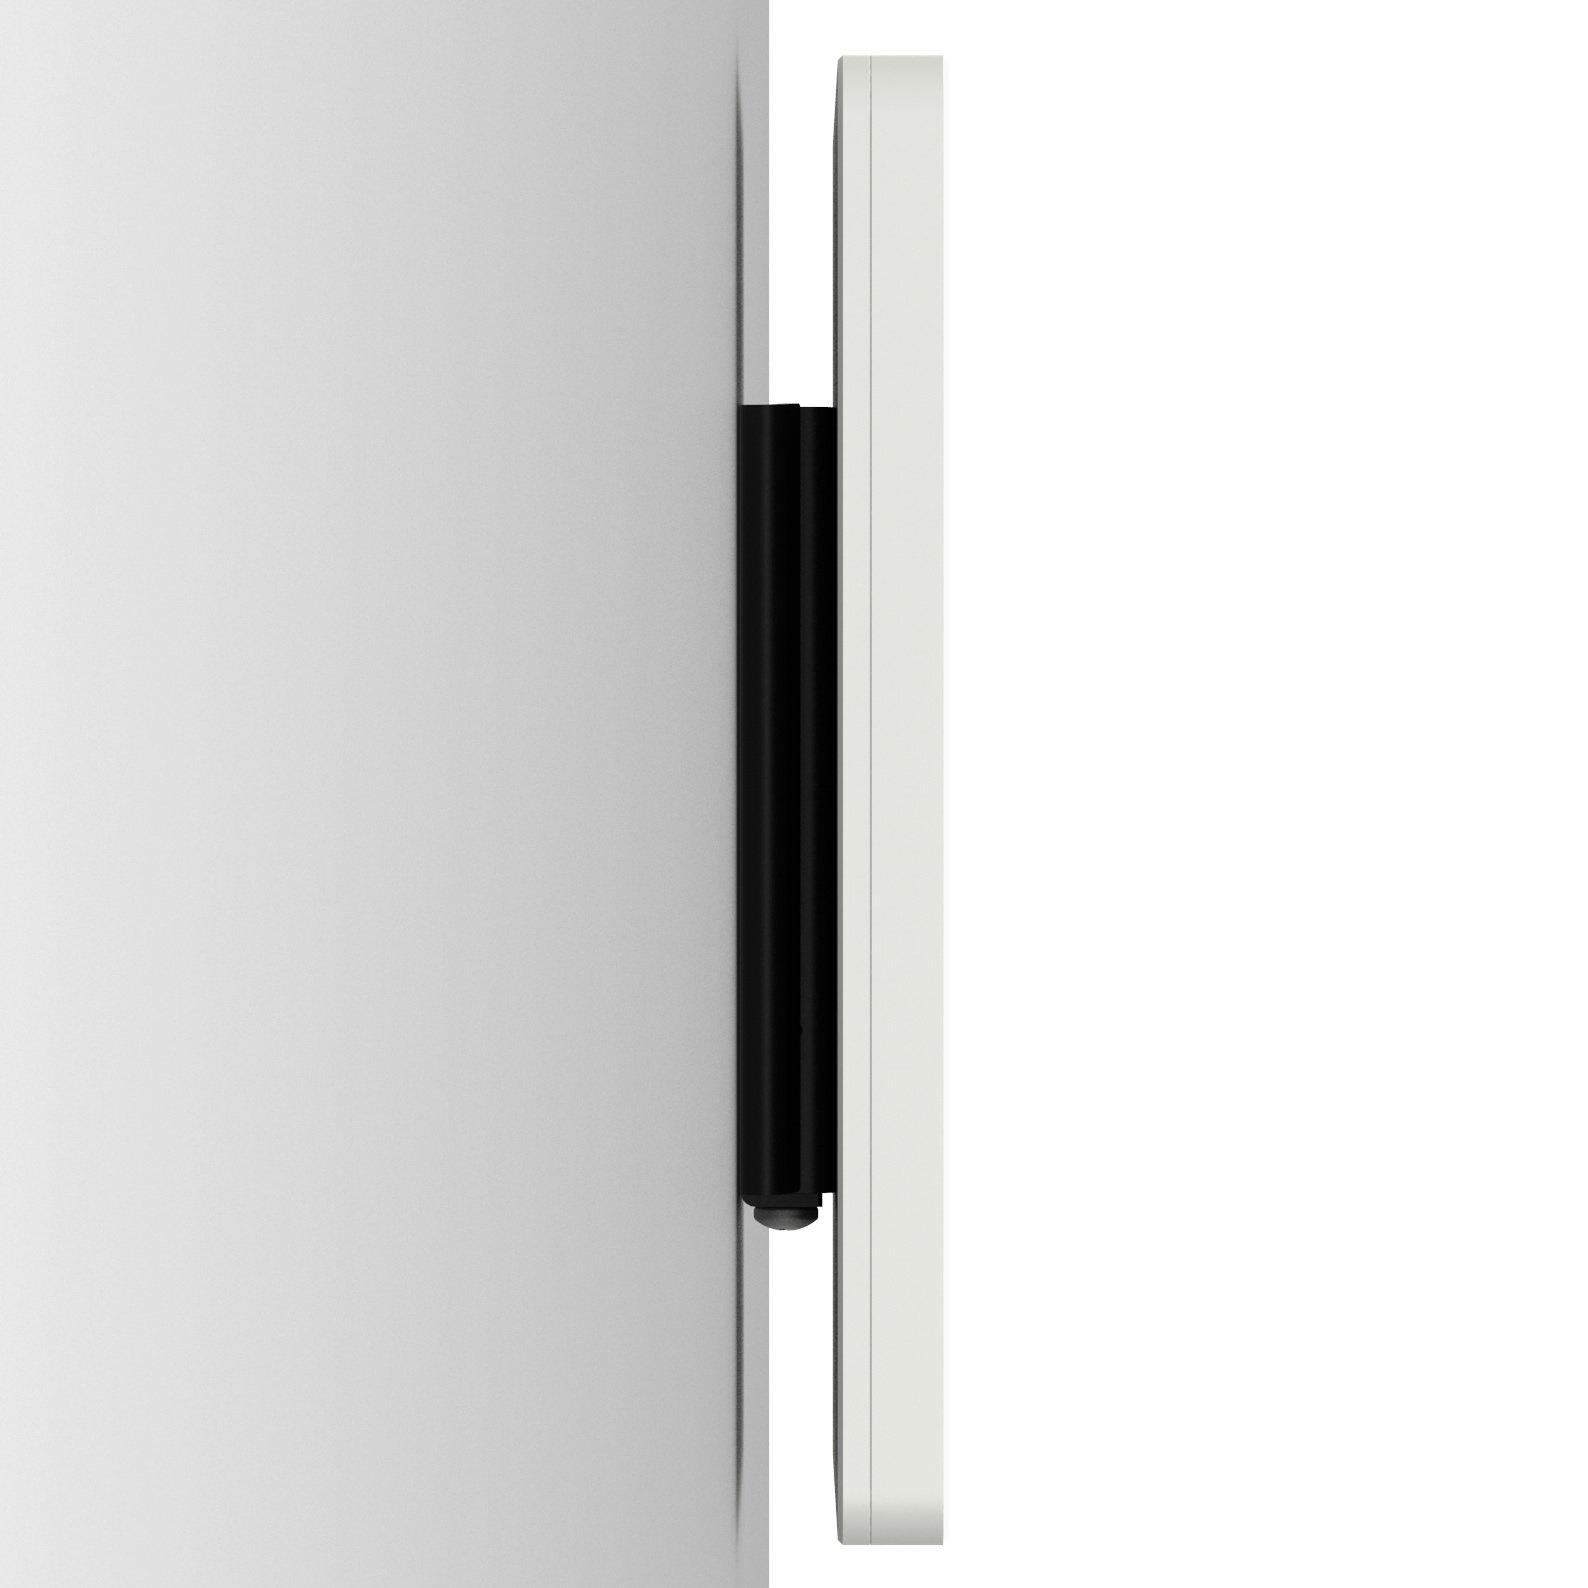 iPad (5th Gen) 9.7/Pro, Air 1/2 White Home Button Covered Fixed Slim VESA Wall Mount [Bundle] by VidaBox Kiosks (Image #3)